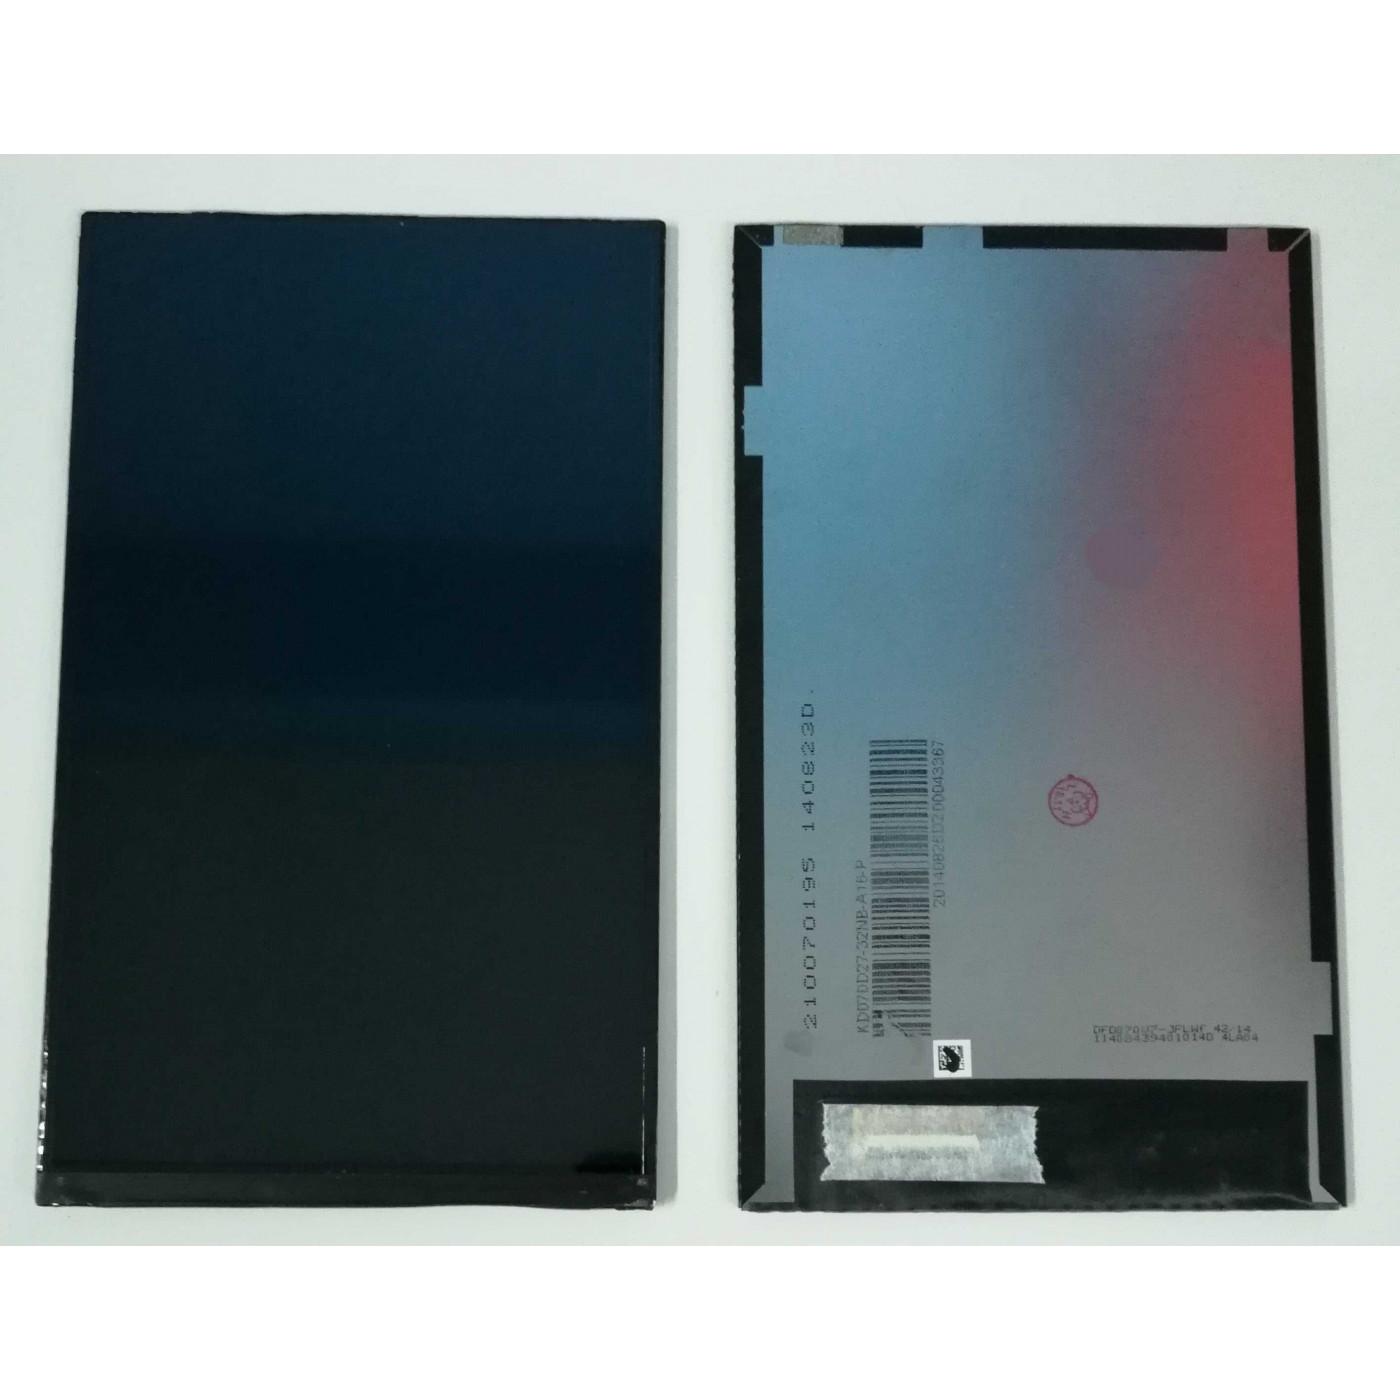 LCD DISPLAY Asus Fonepad 7 K012 K017 FE170CG ME170 K01A SCREEN MONITOR